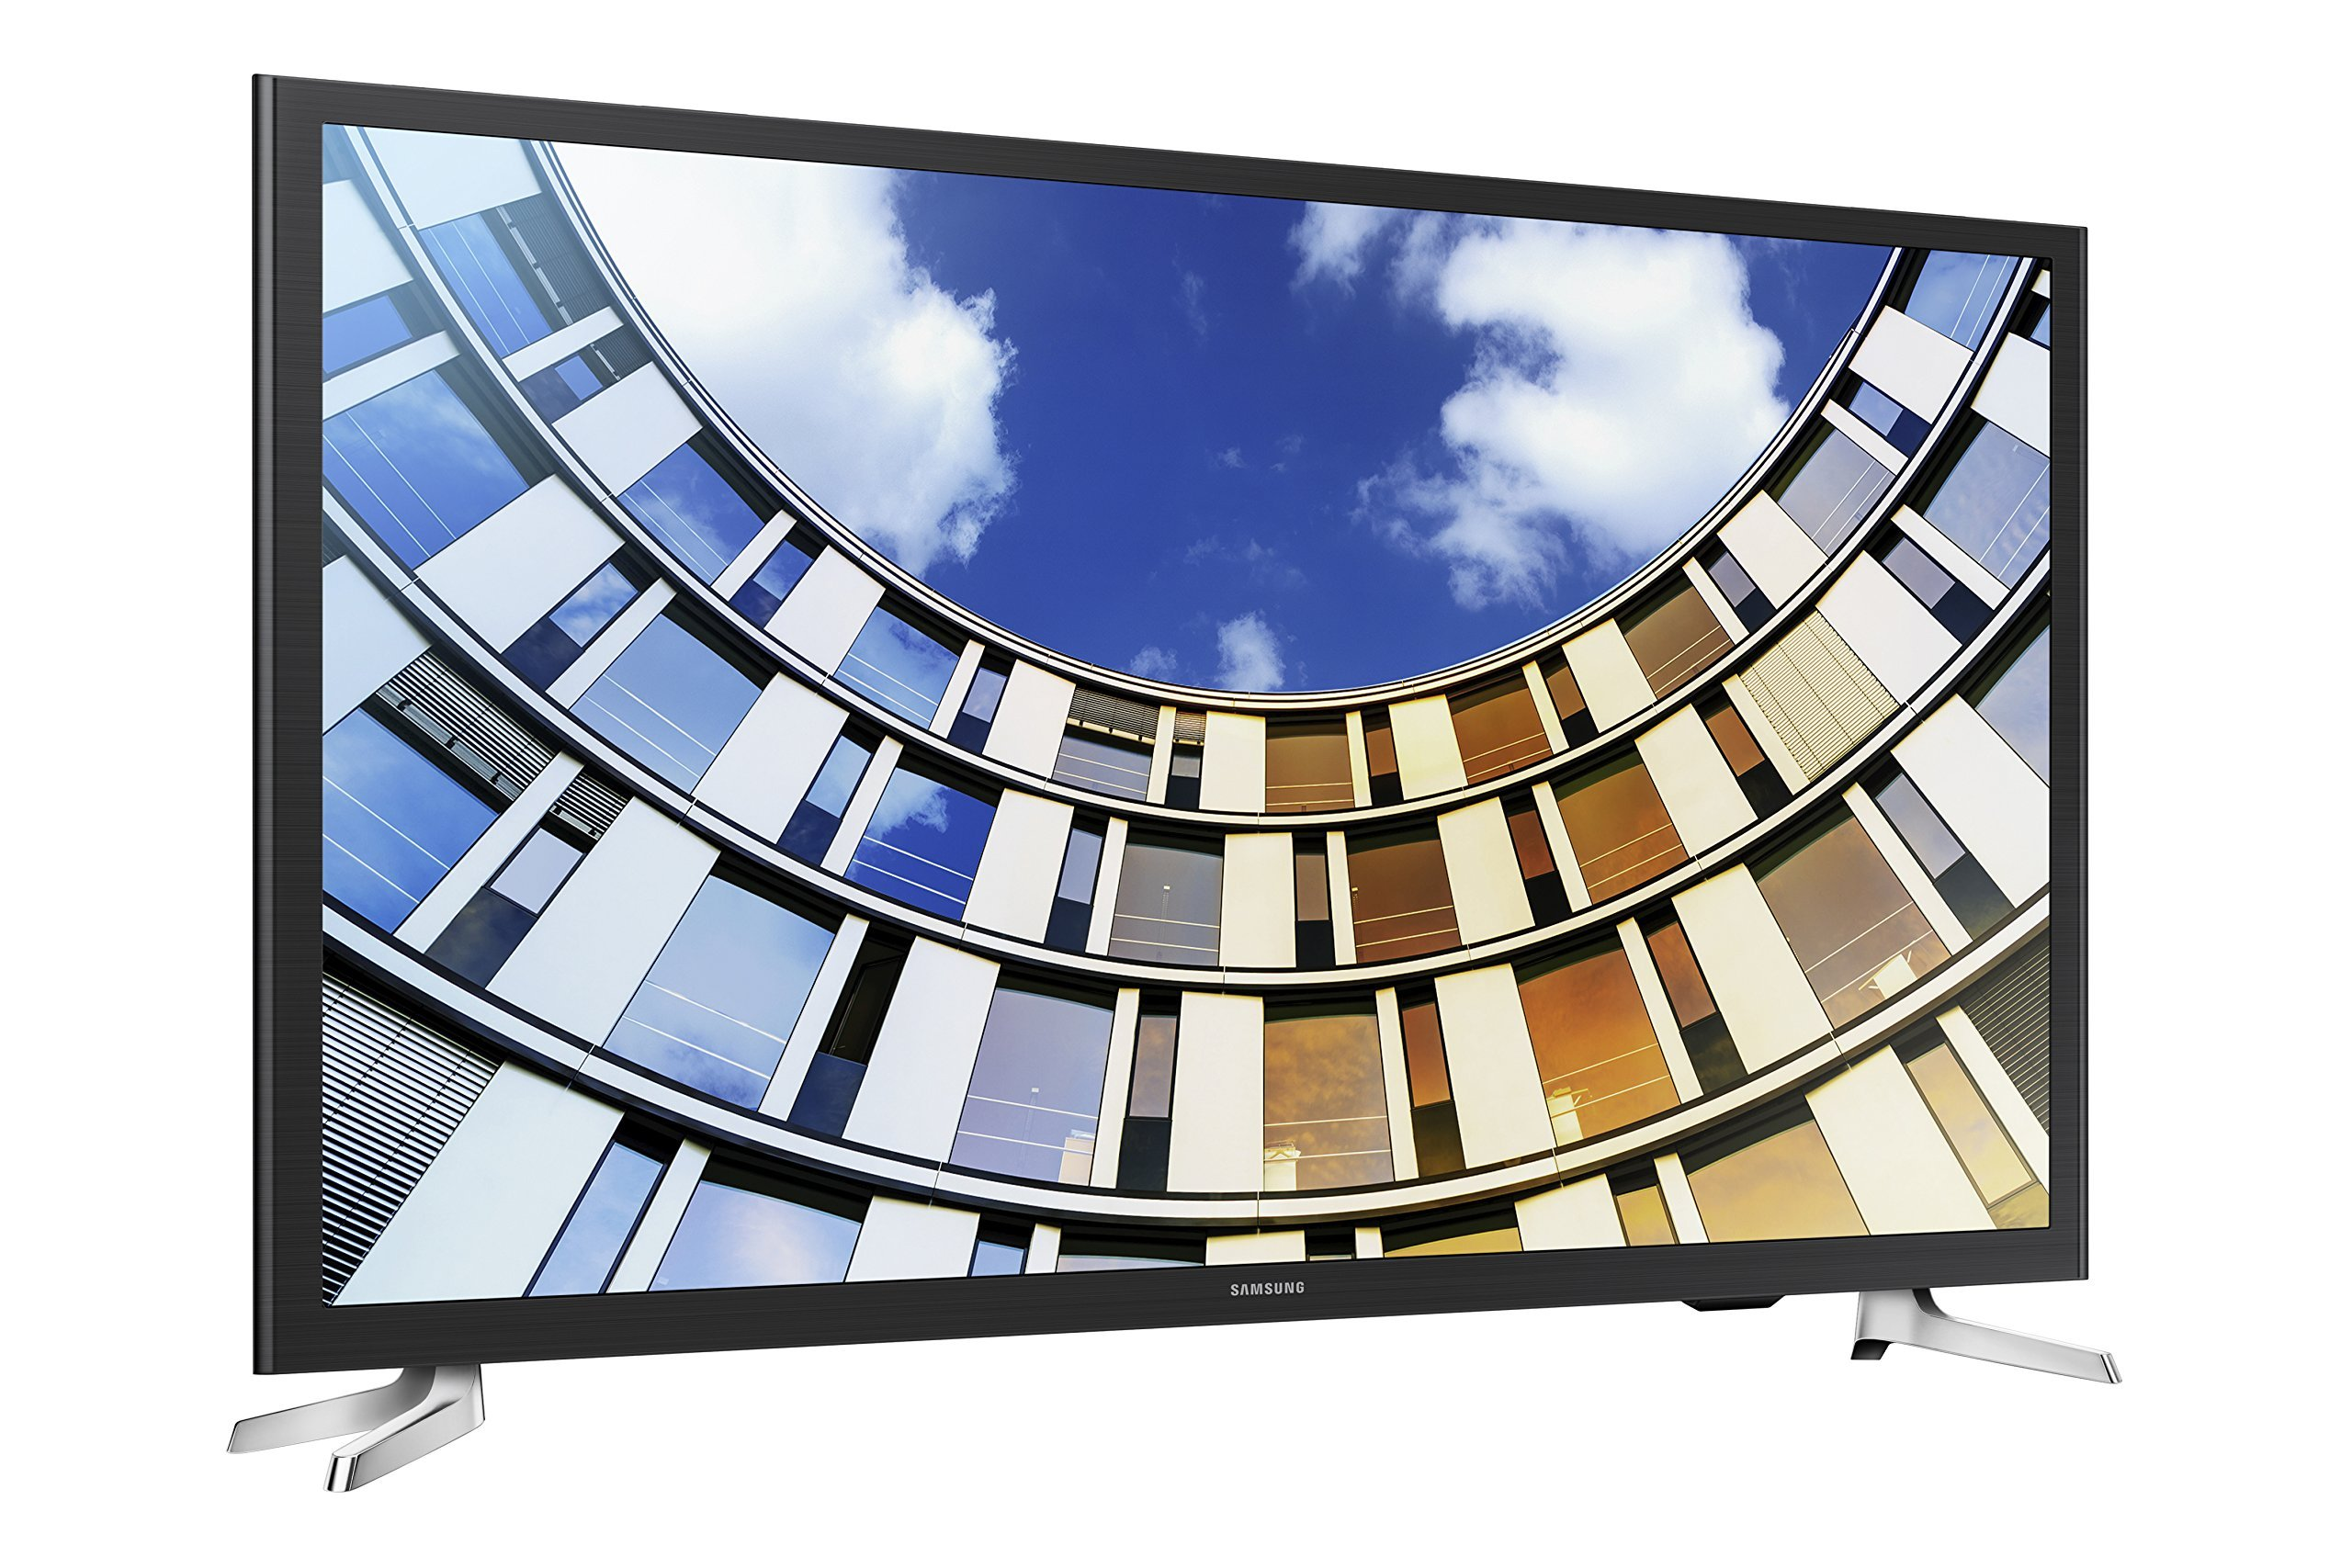 Samsung Electronics UN40M5300AFXZA Flat LED 1920 x 1080p 5 Series SmartTV 2017 (Certified Refurbished) 3